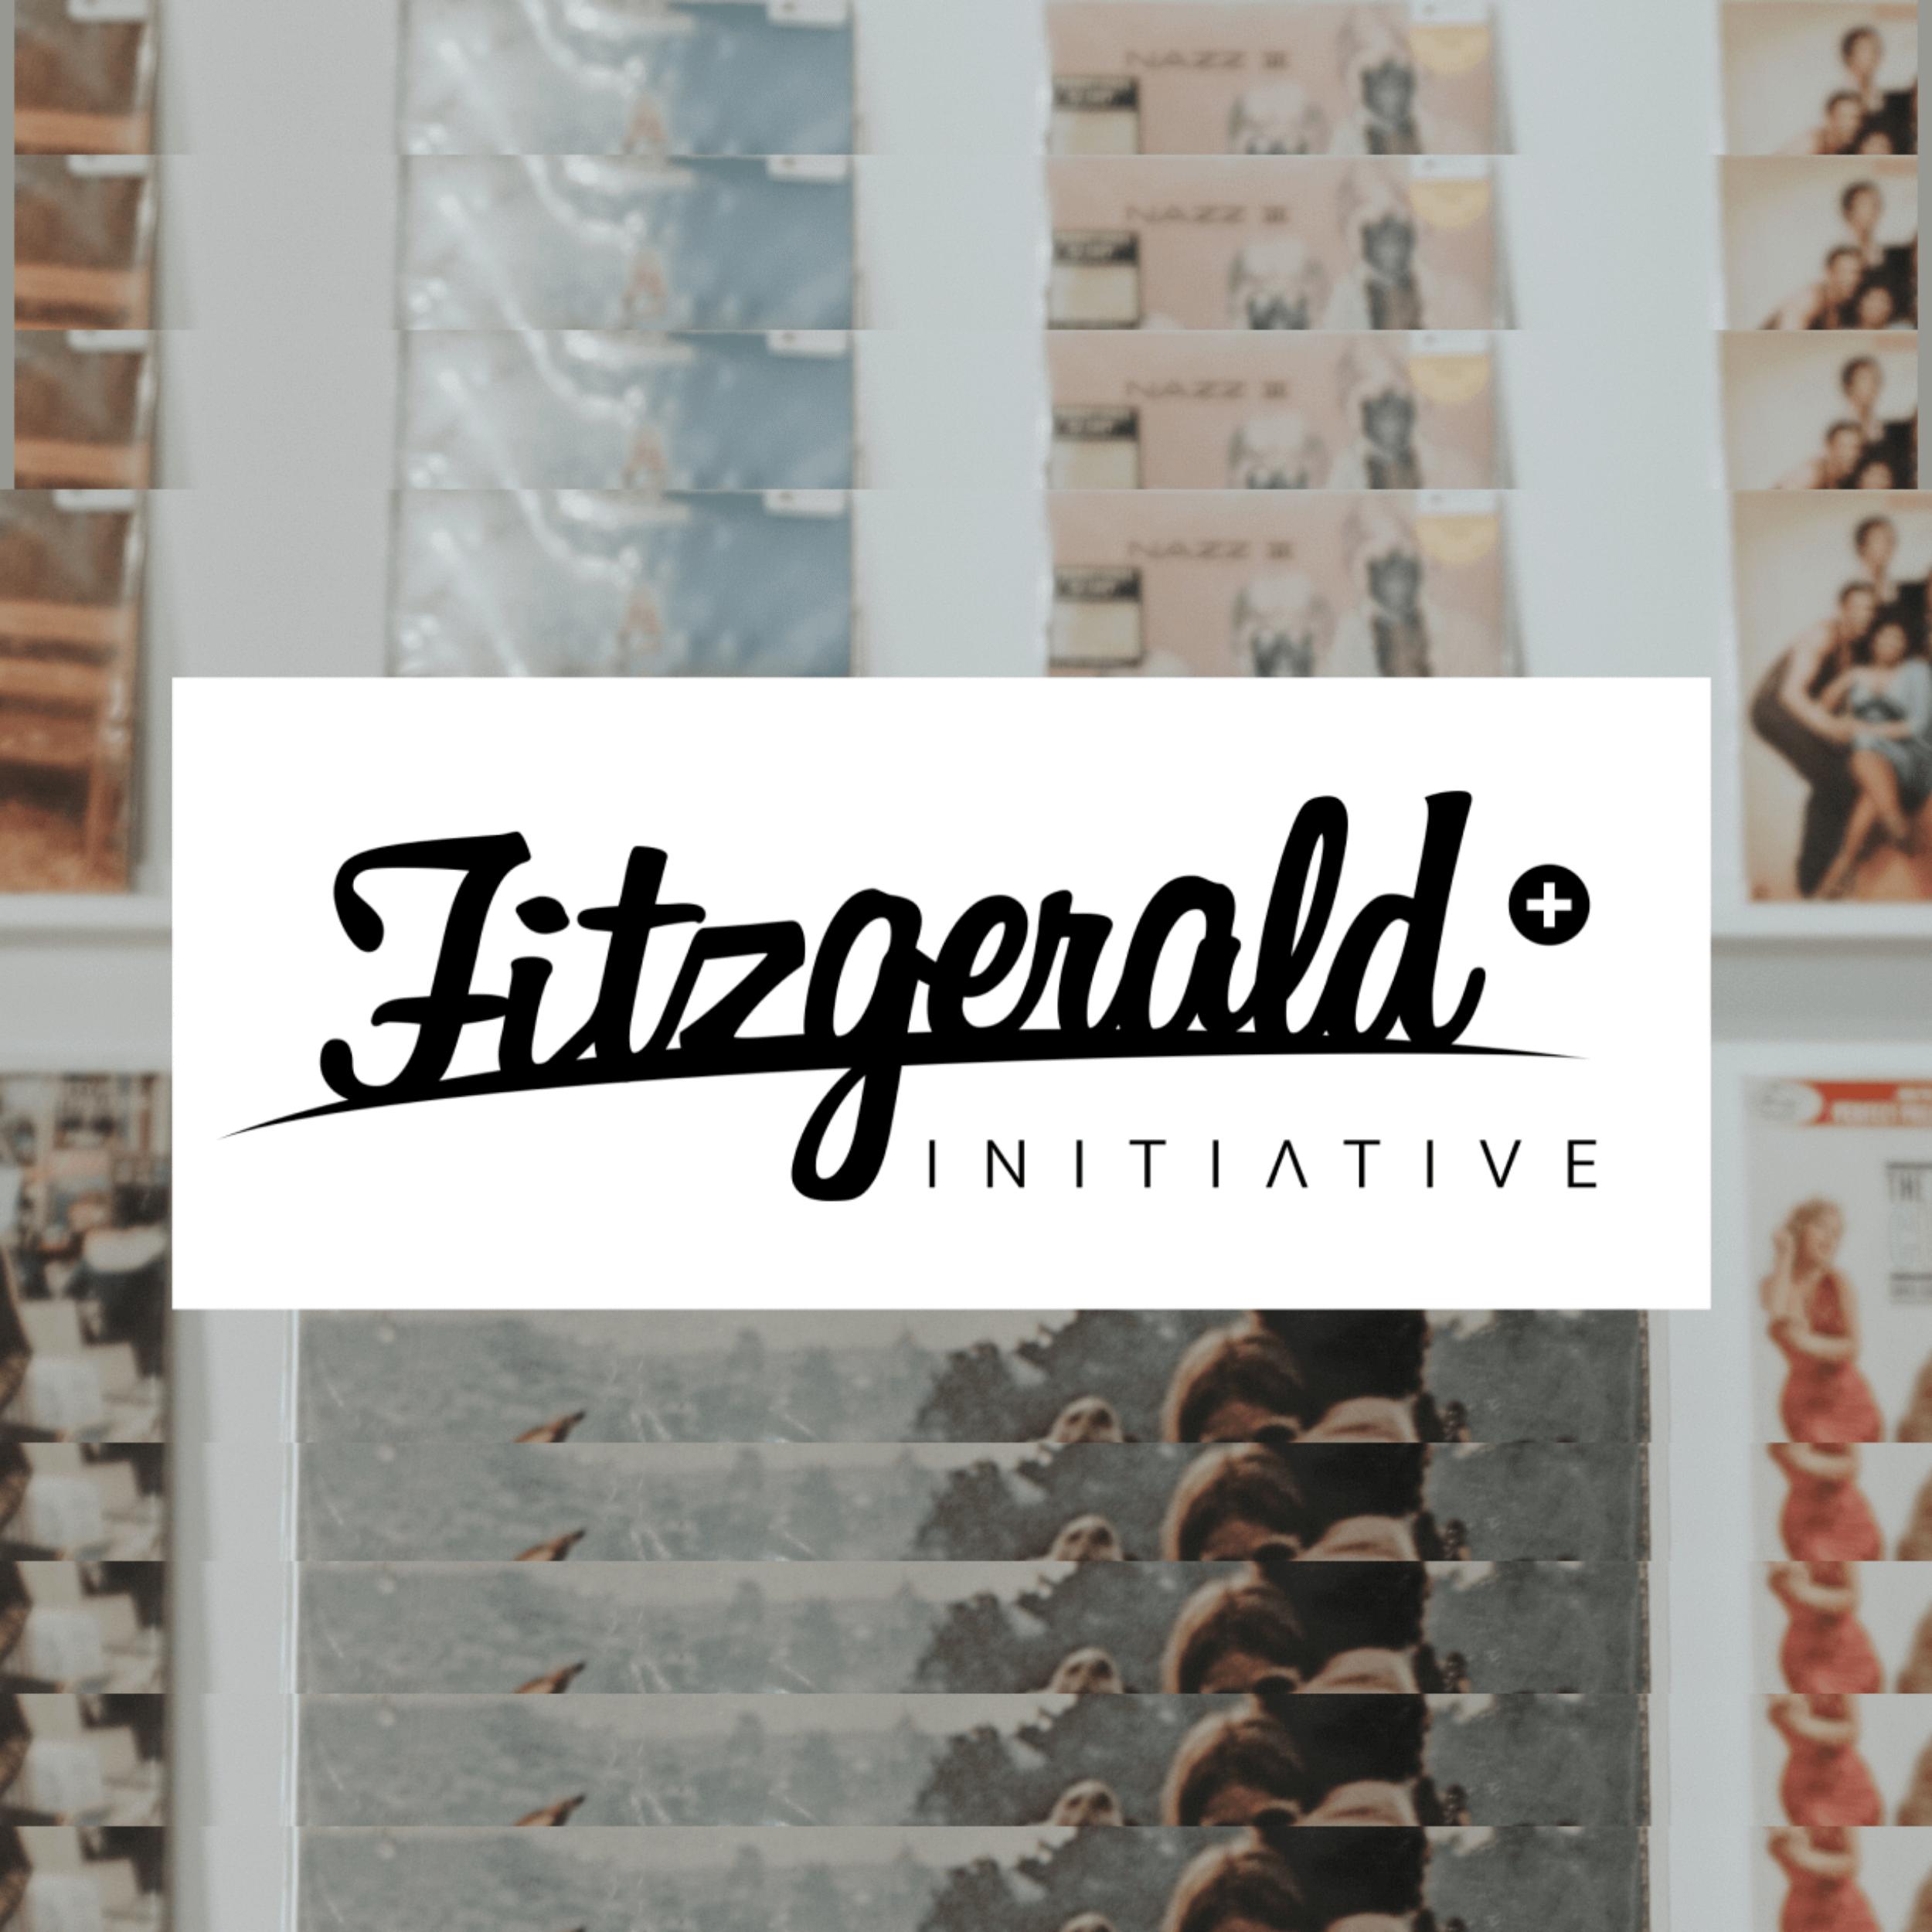 Het Fitzgerald Initiative